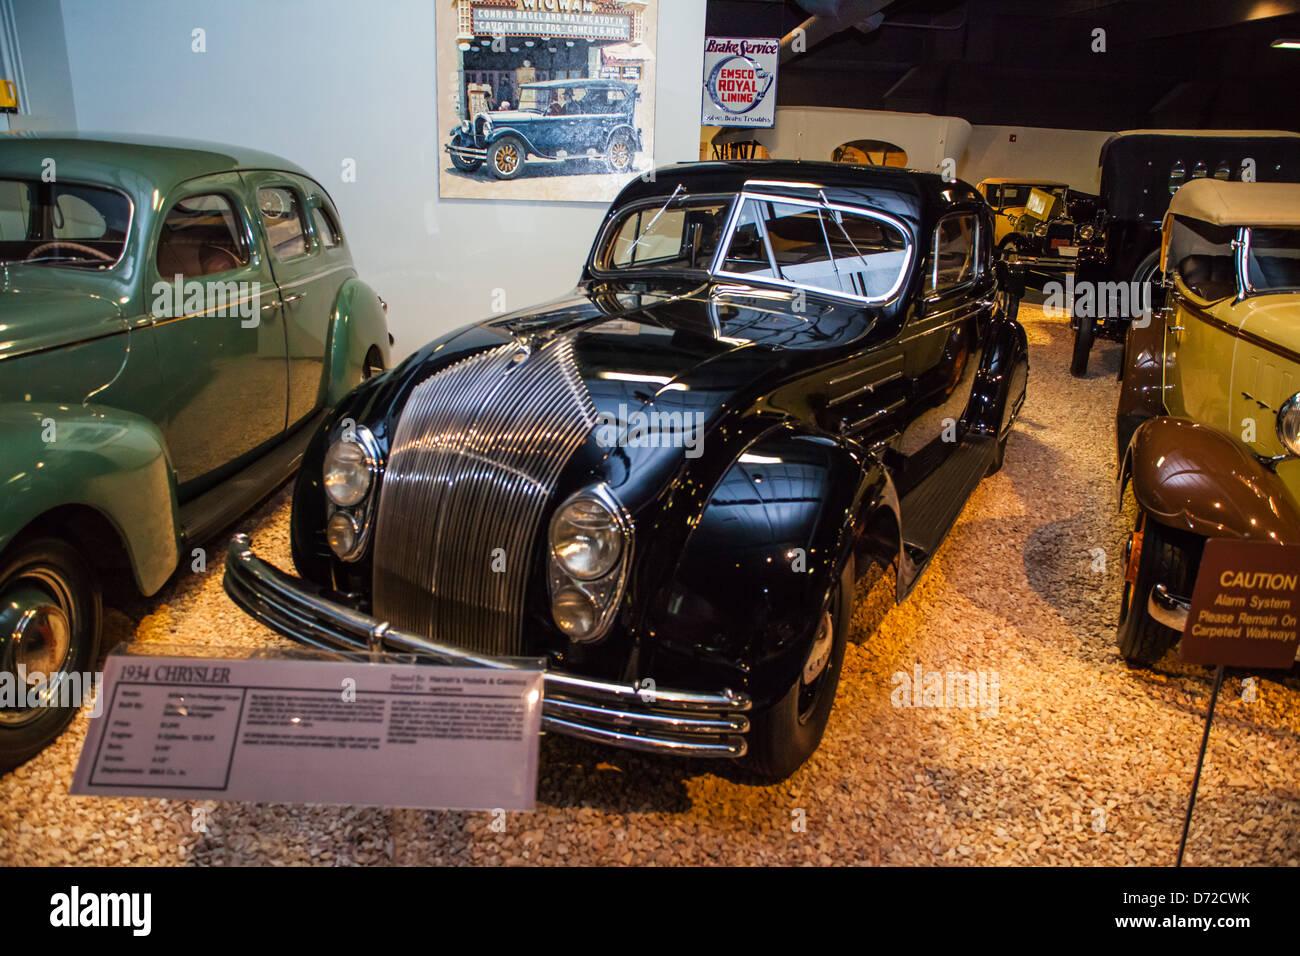 classic car reno car museum stockfotos & classic car reno car museum